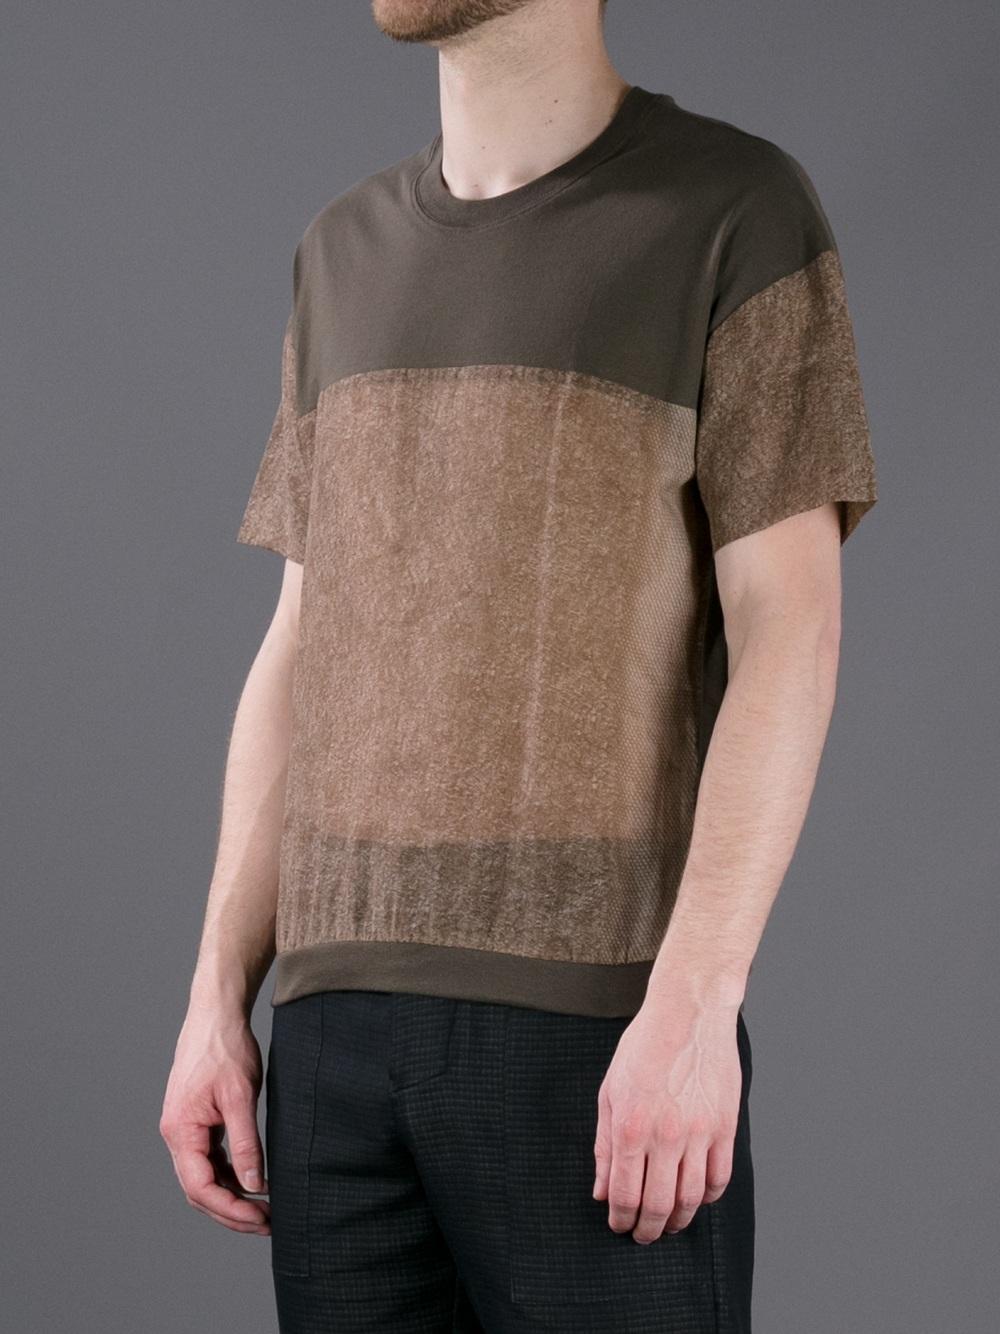 stephan-schneider-green-contrast-panel-tshirt-product-3-8359994-697280624.jpeg